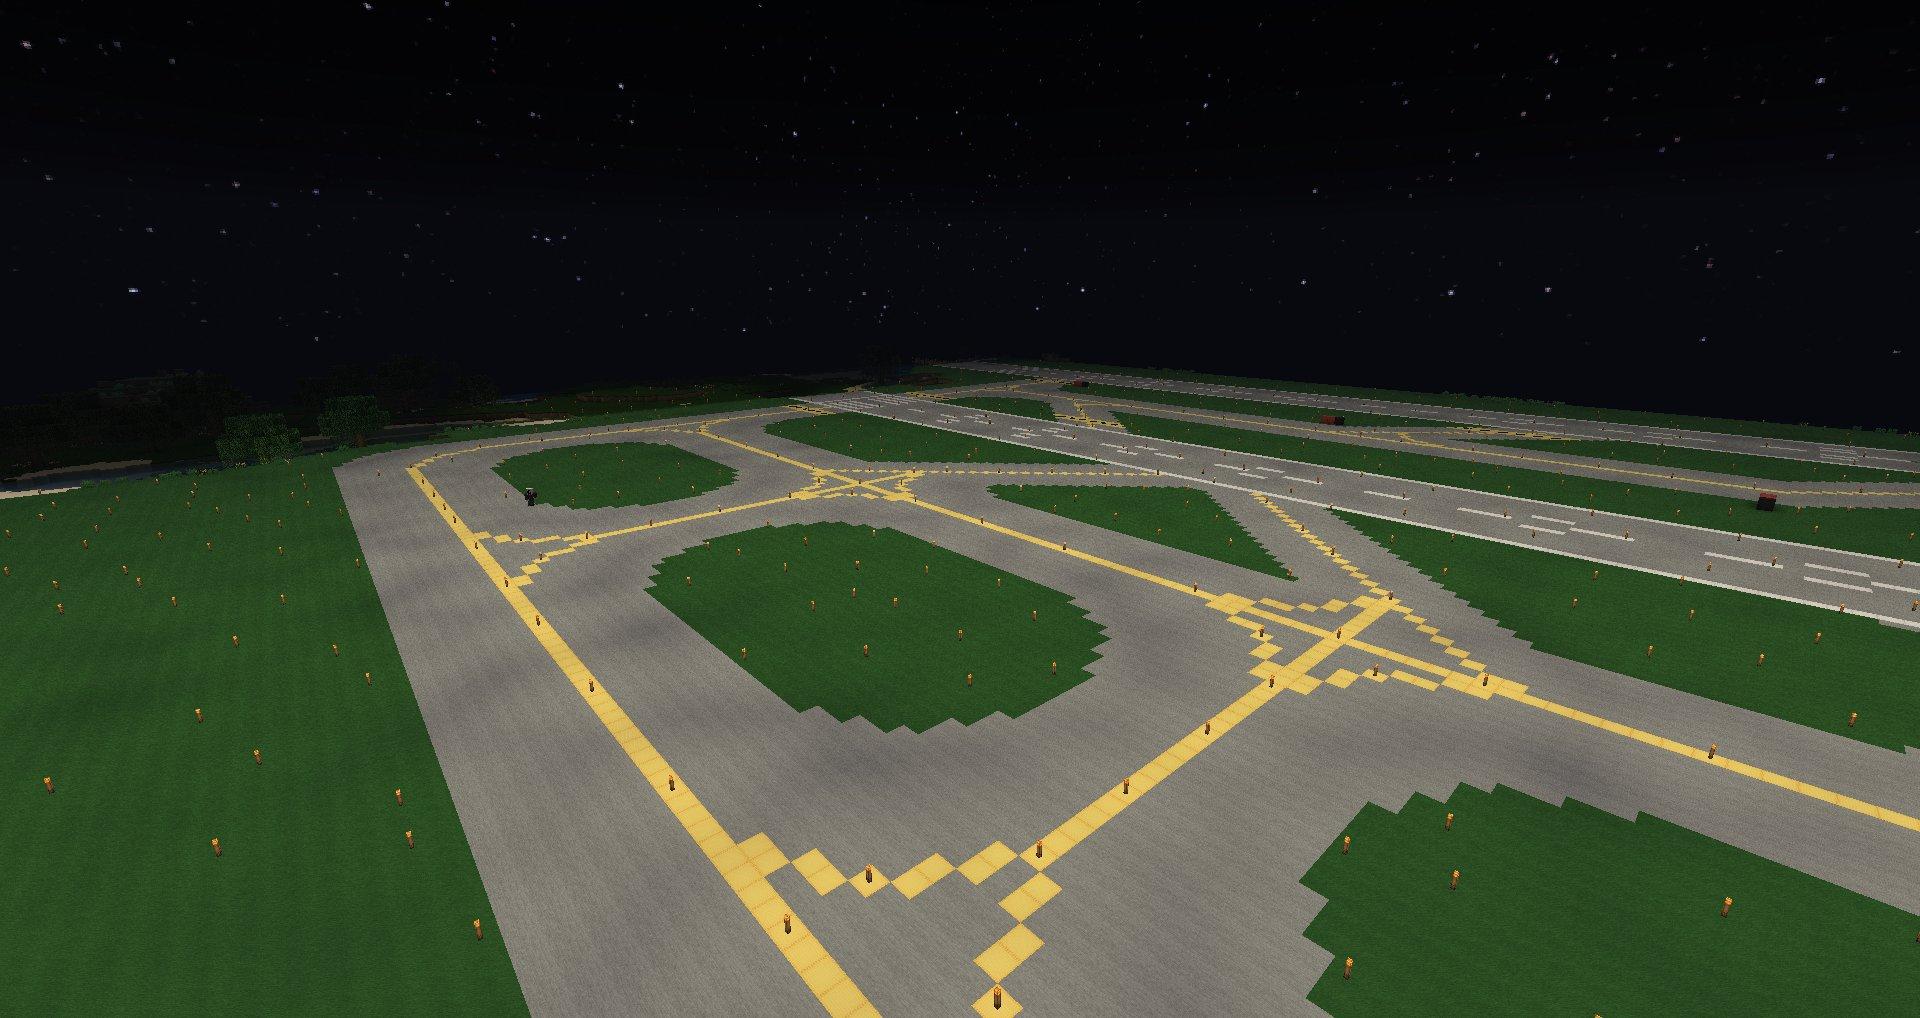 [PROJET] Aéroport International de Rodwin. - Page 2 F34e6bdf-eb47-4040-bb58-278af97e4b1d